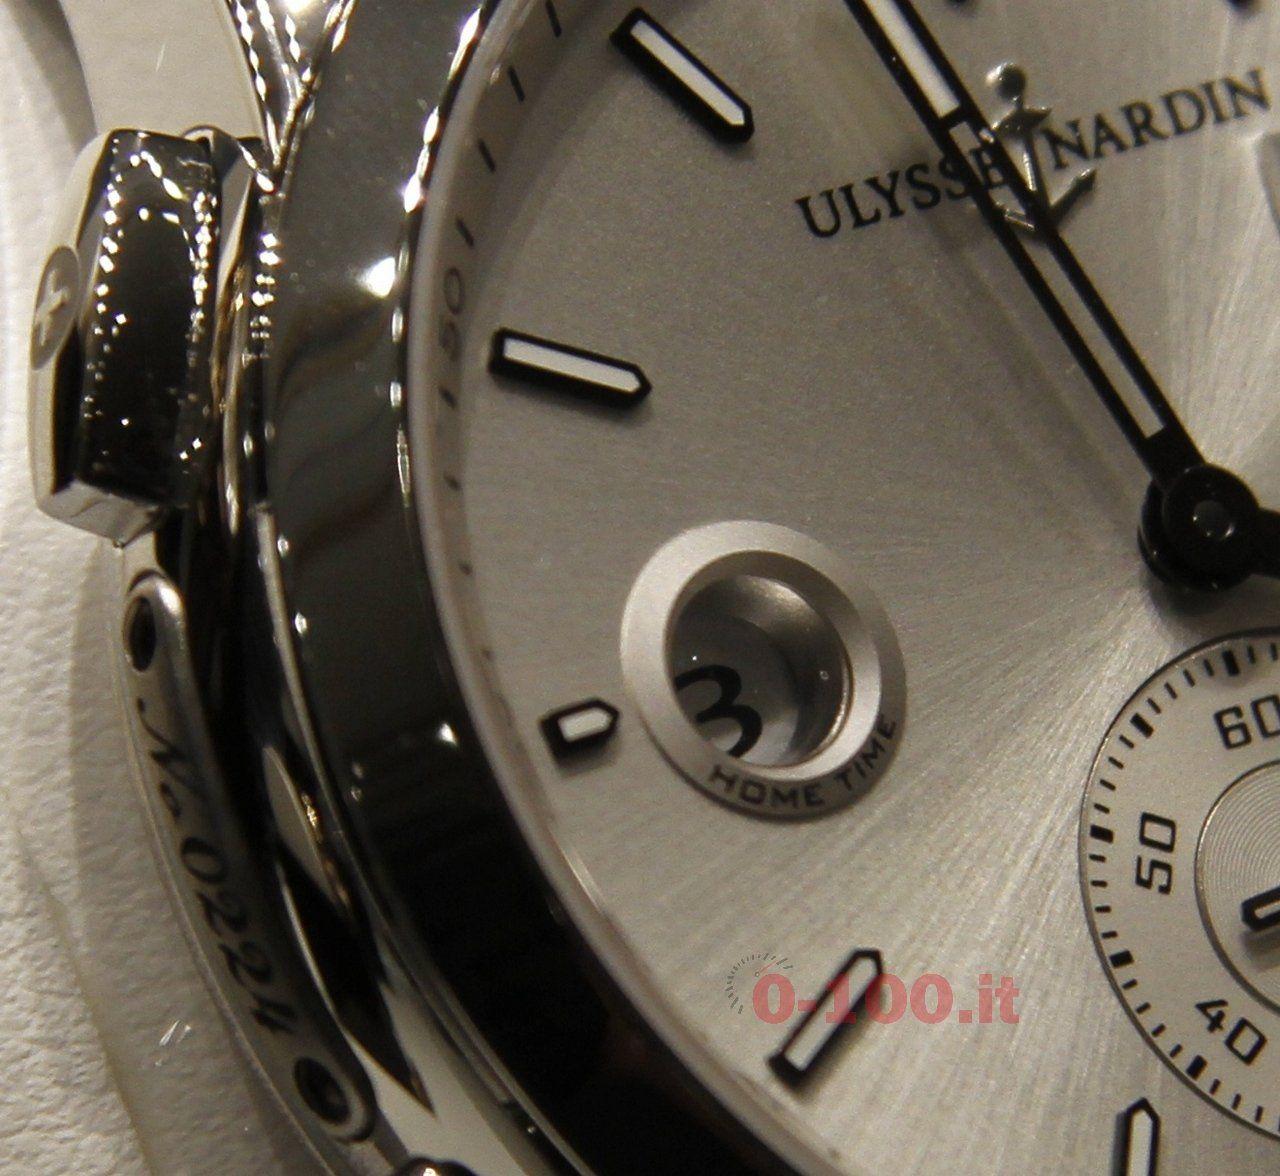 baselworld-2014-Ulysse Nardin Dual Time Manufacture_Ref_3346-126-91_0-1002